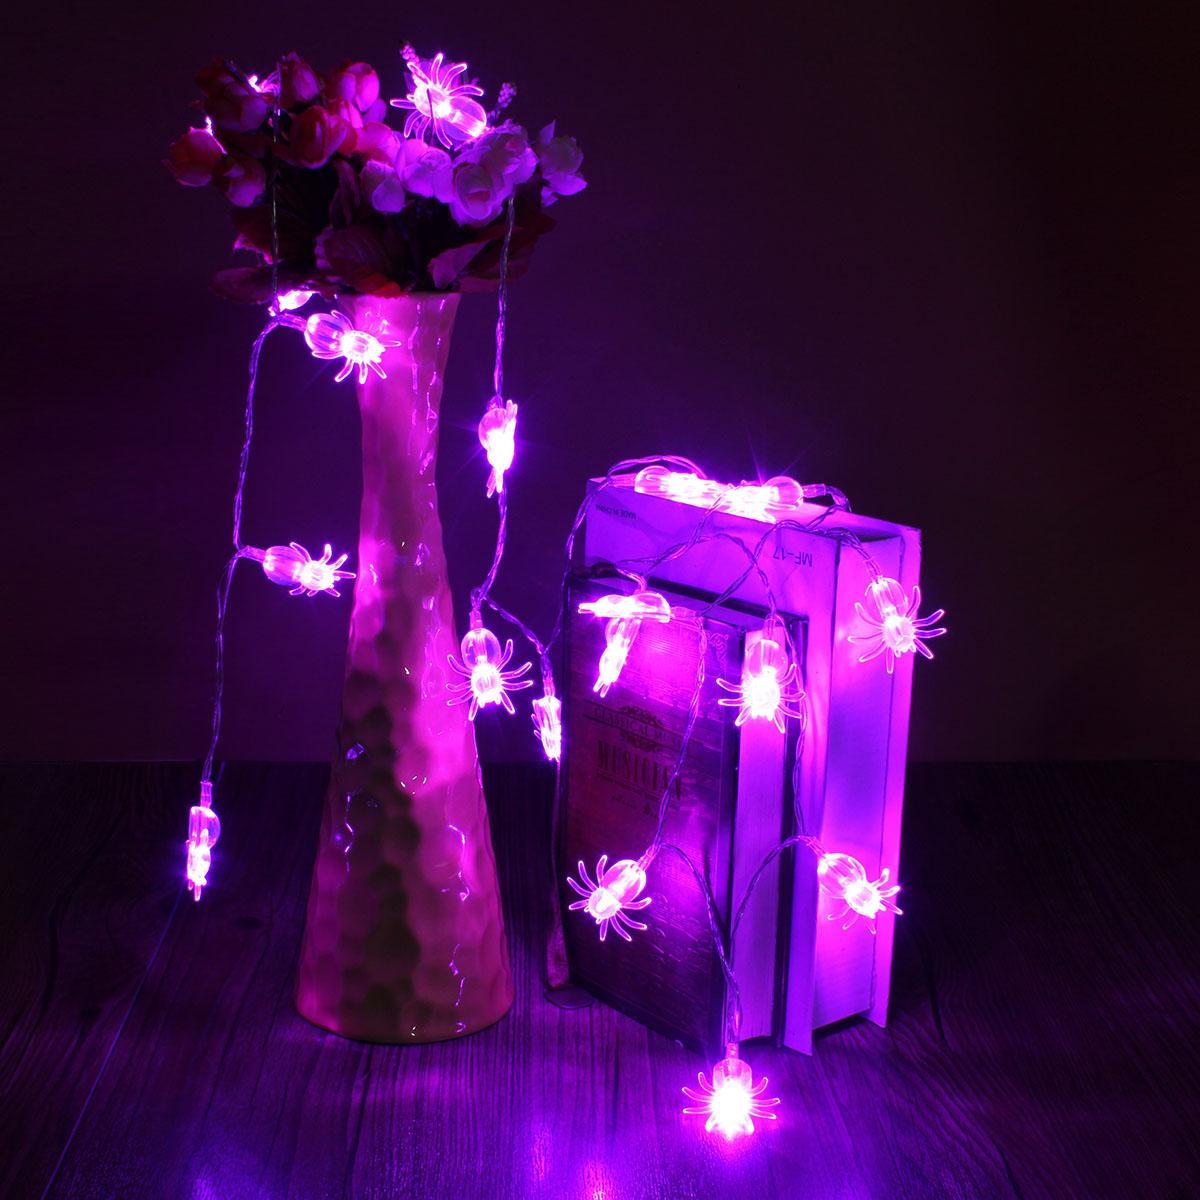 Blue led spider light halloween party decration lights